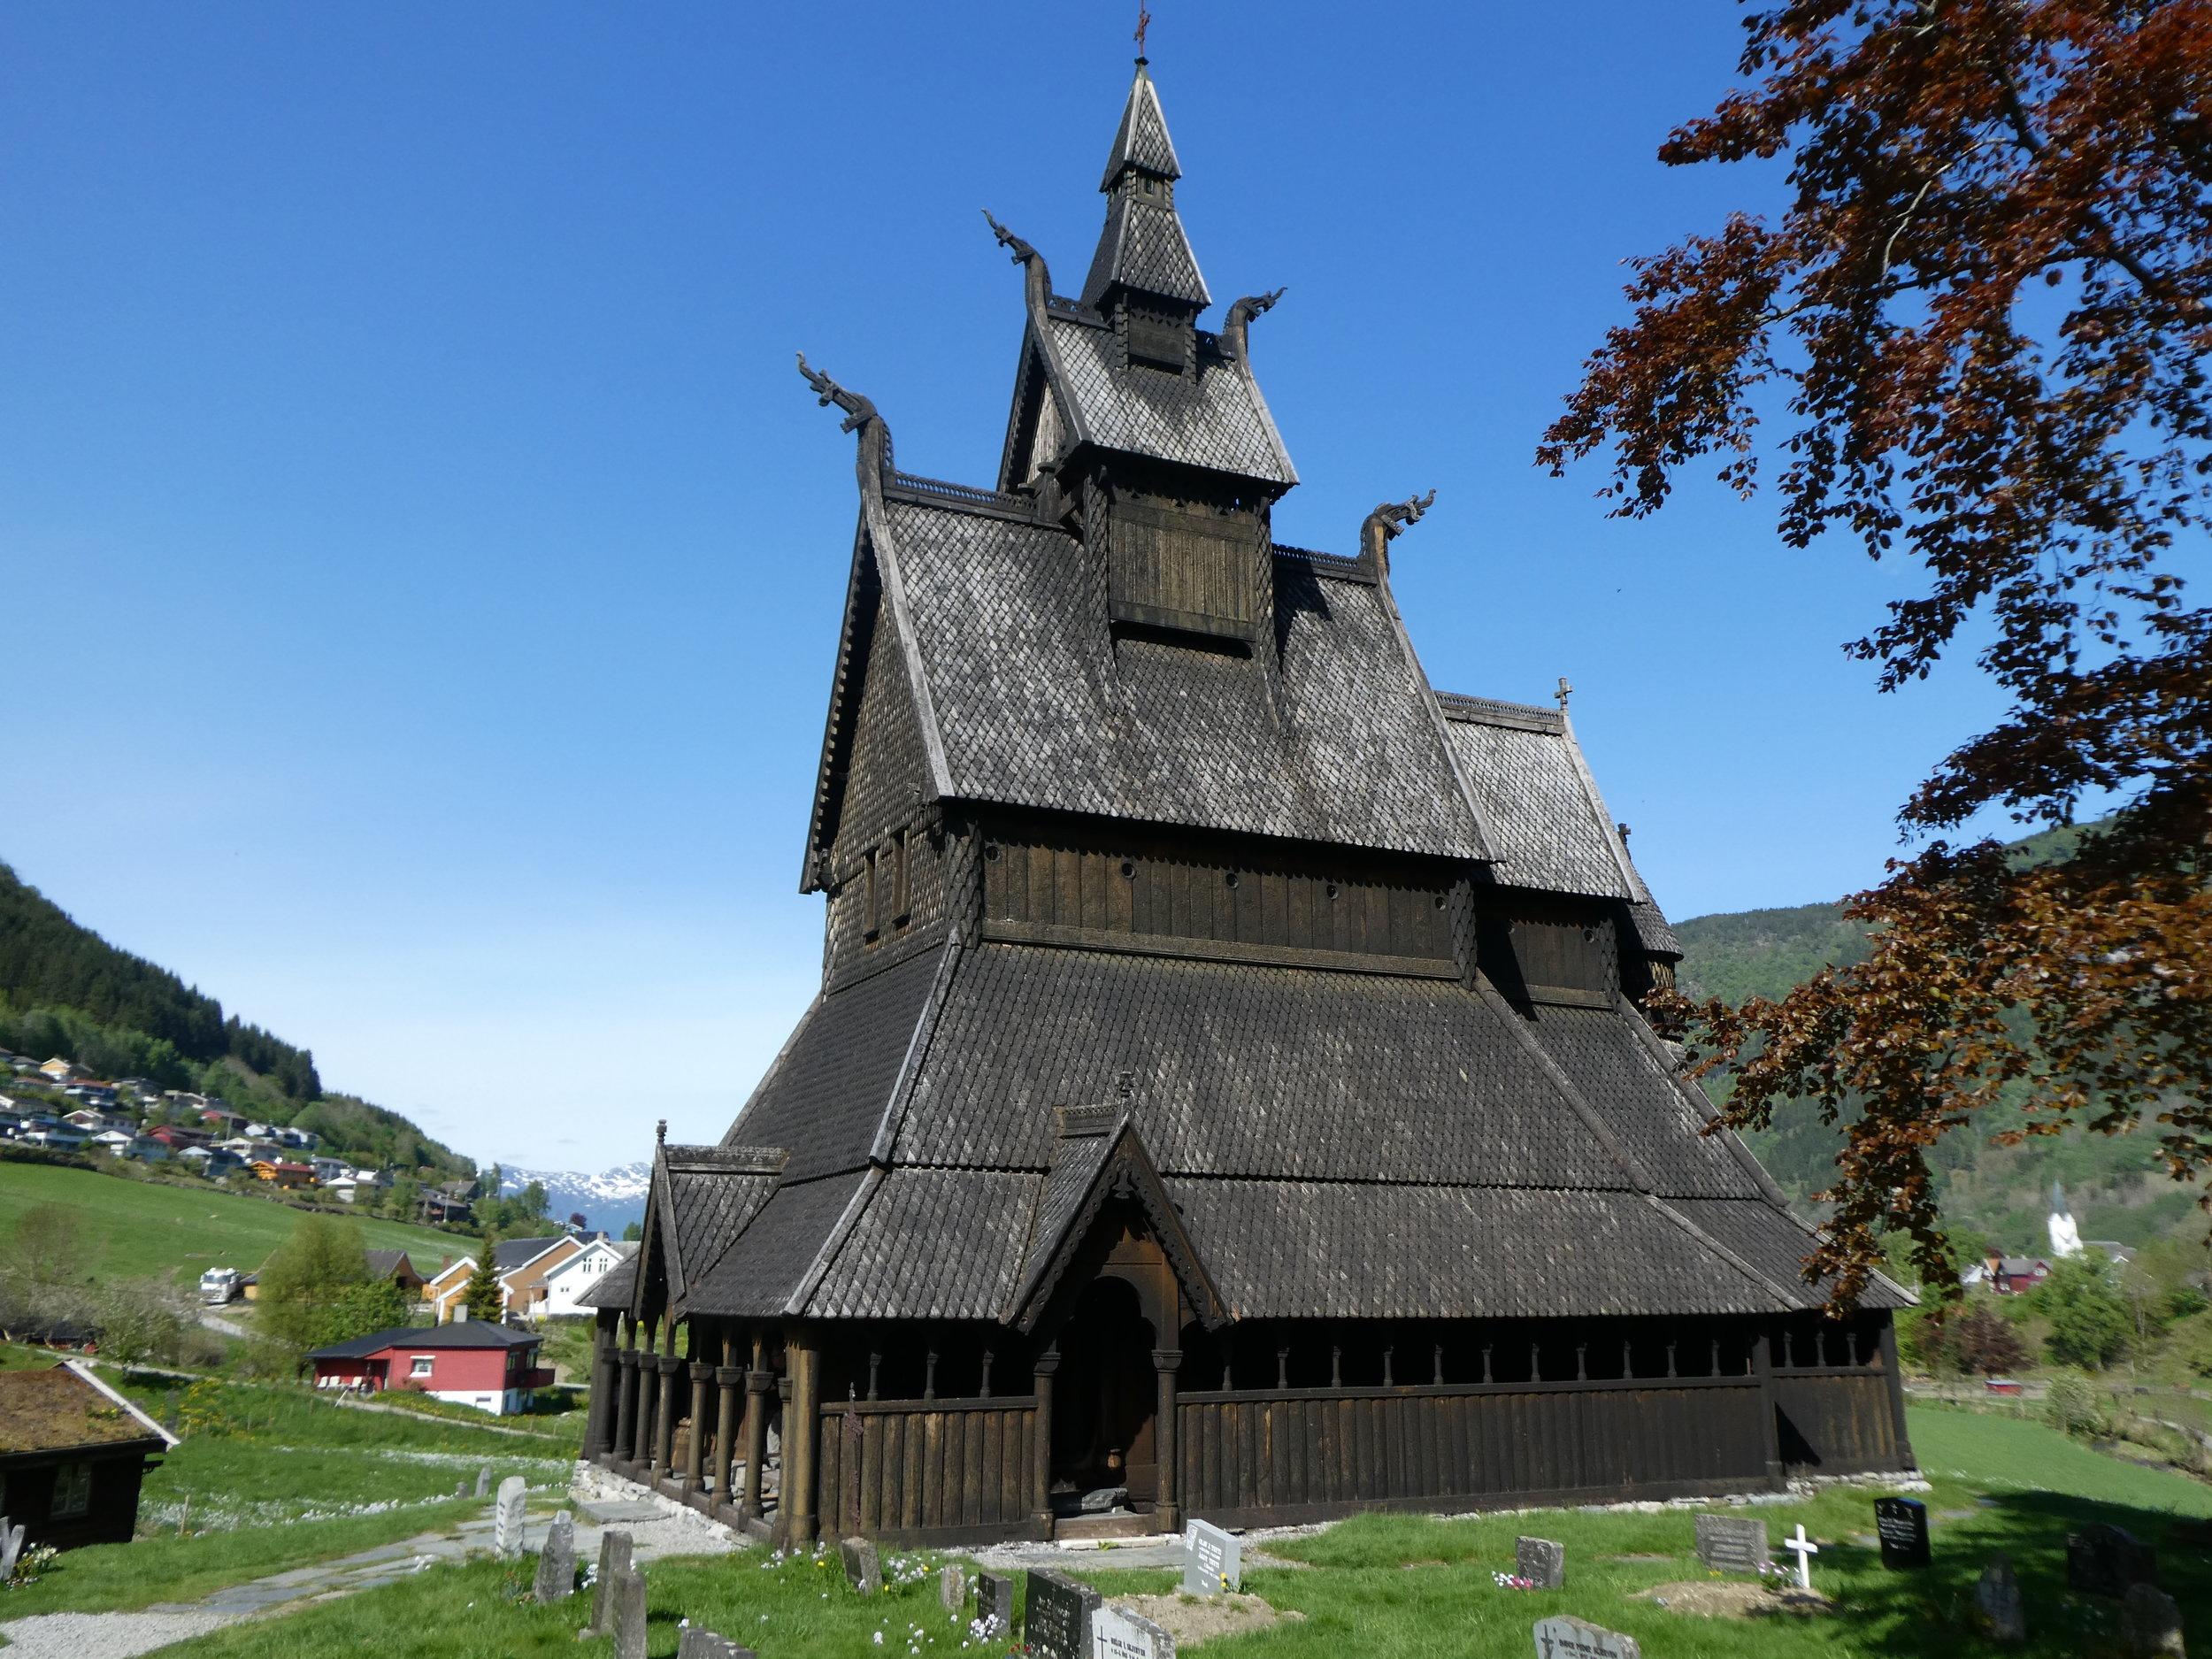 Stave church.